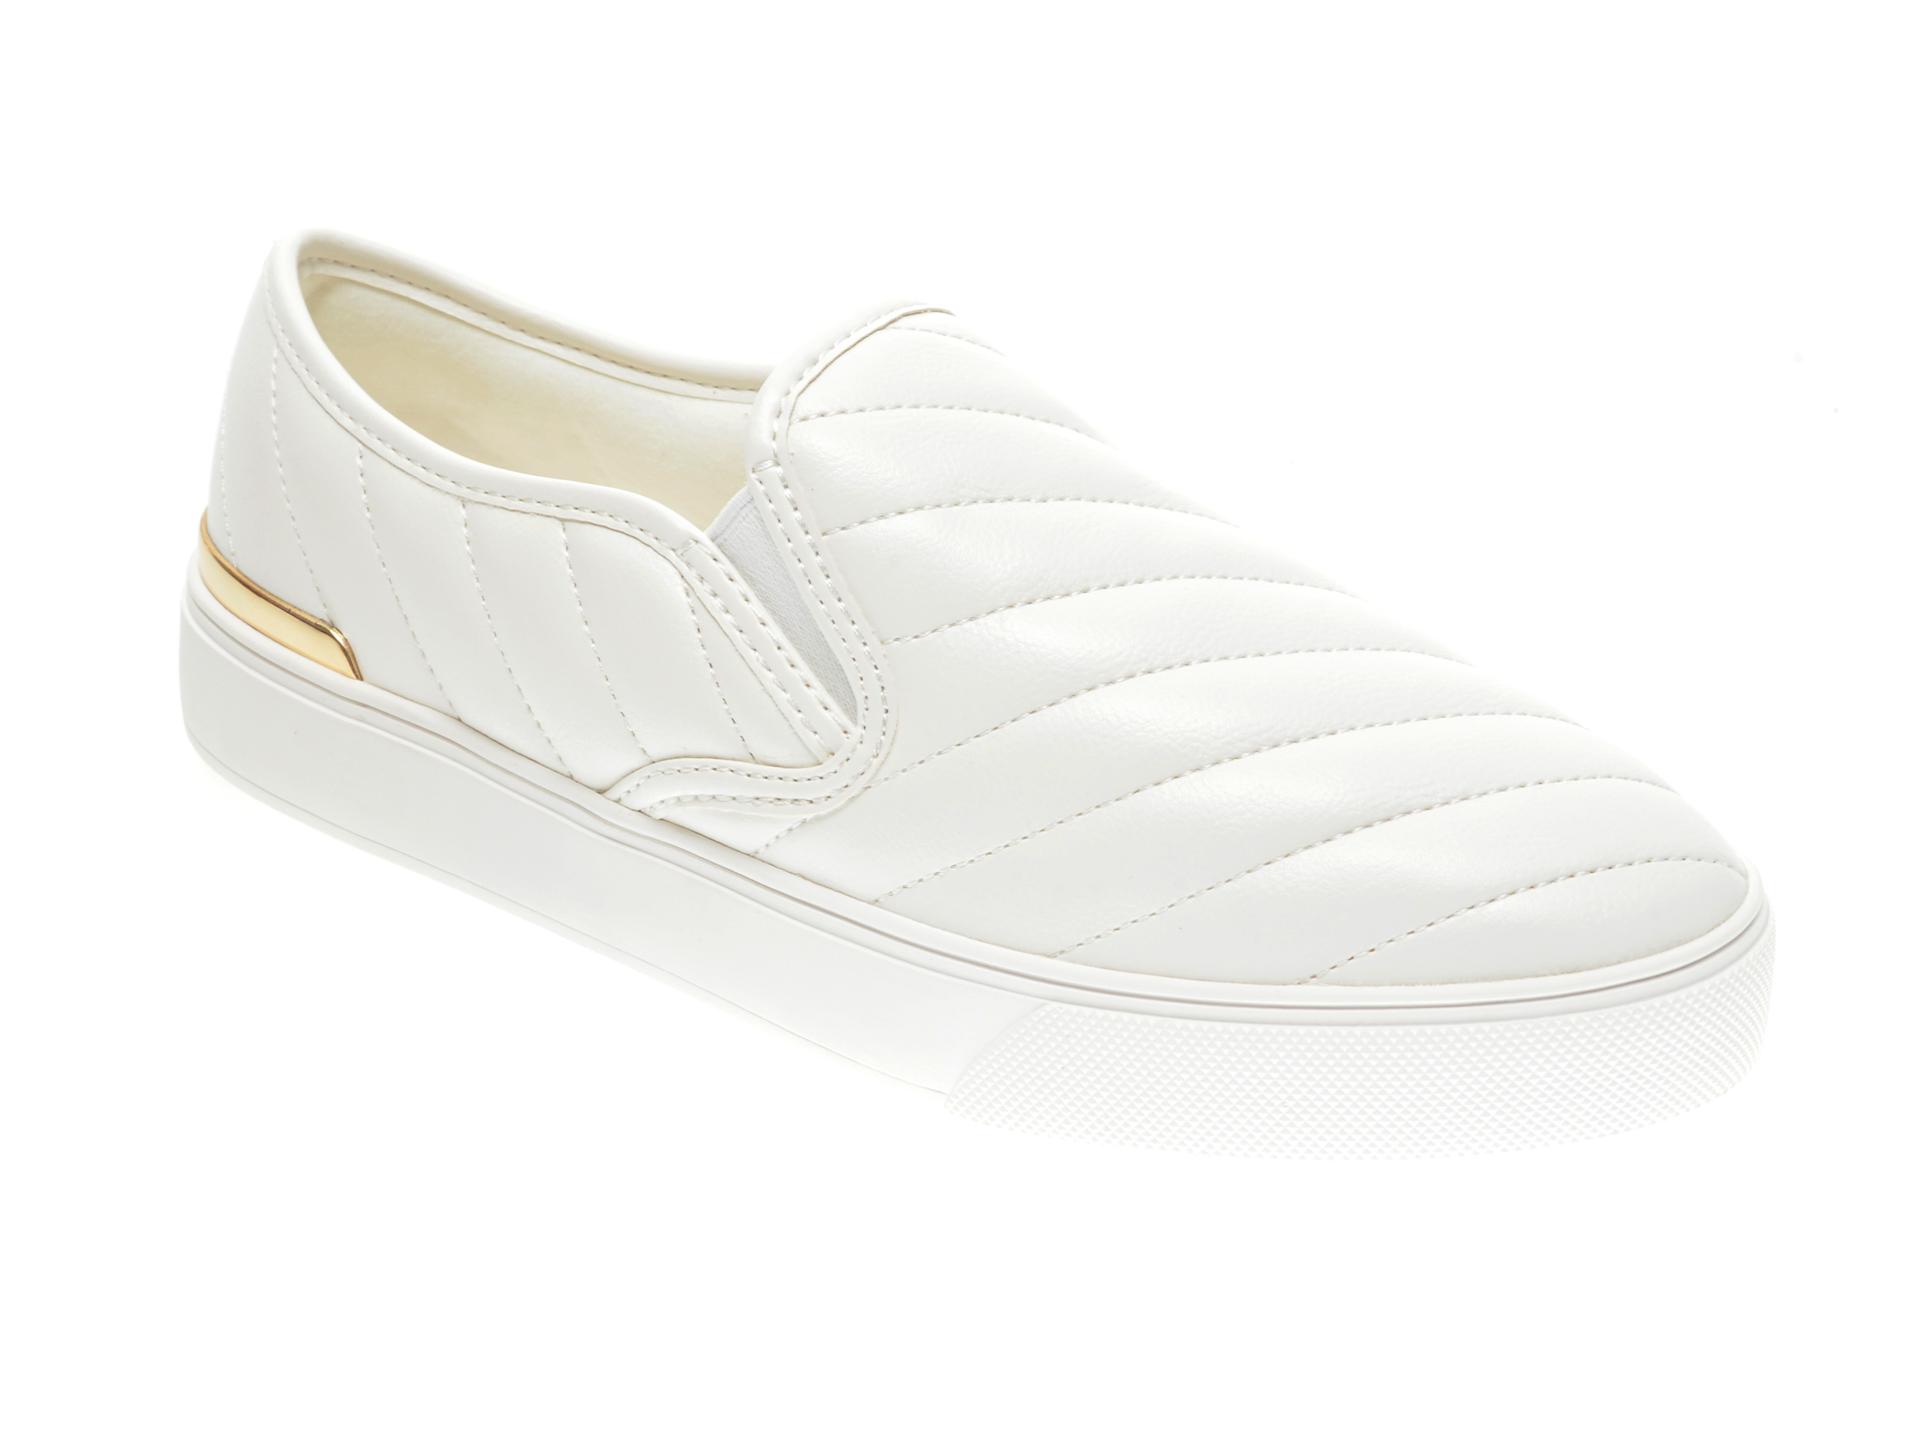 Pantofi Aldo Albi, Chevron100, Din Piele Ecologica